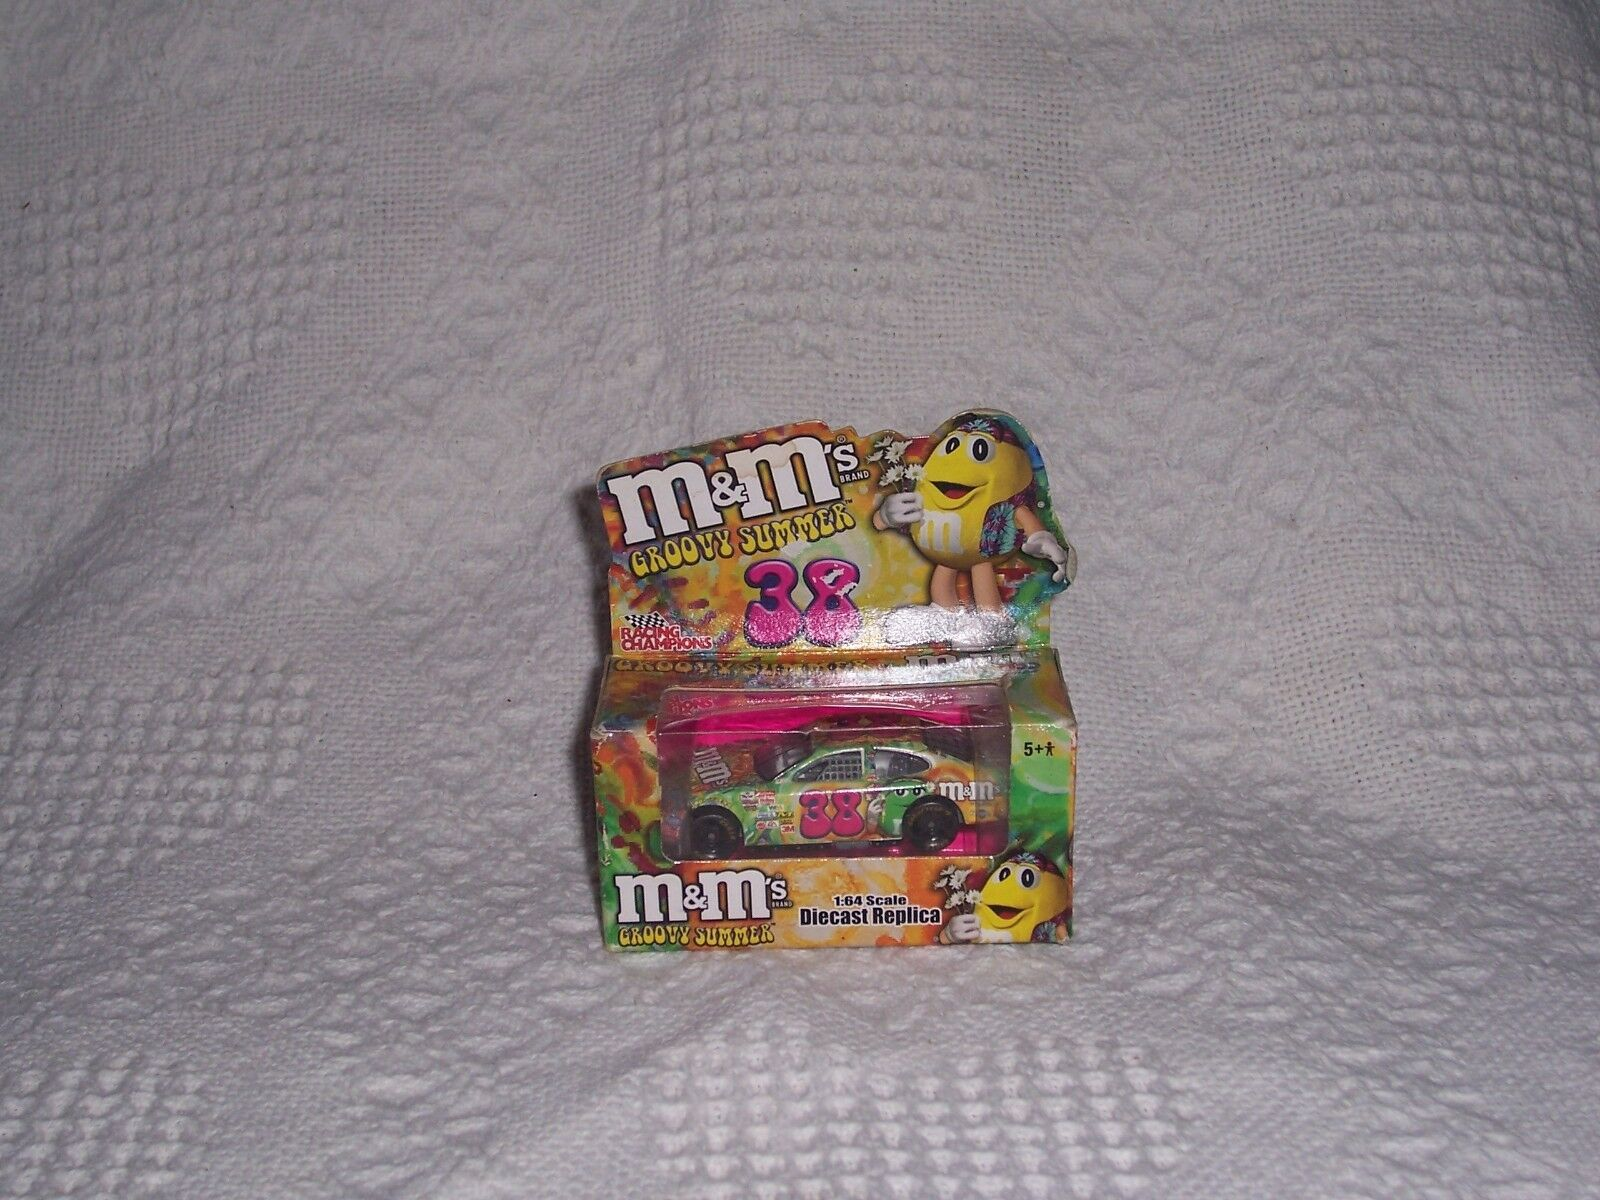 (108) NIP- M&M's Groovy Summer Ford Taurus-1 64 Diecast Replica - RC2 Brand